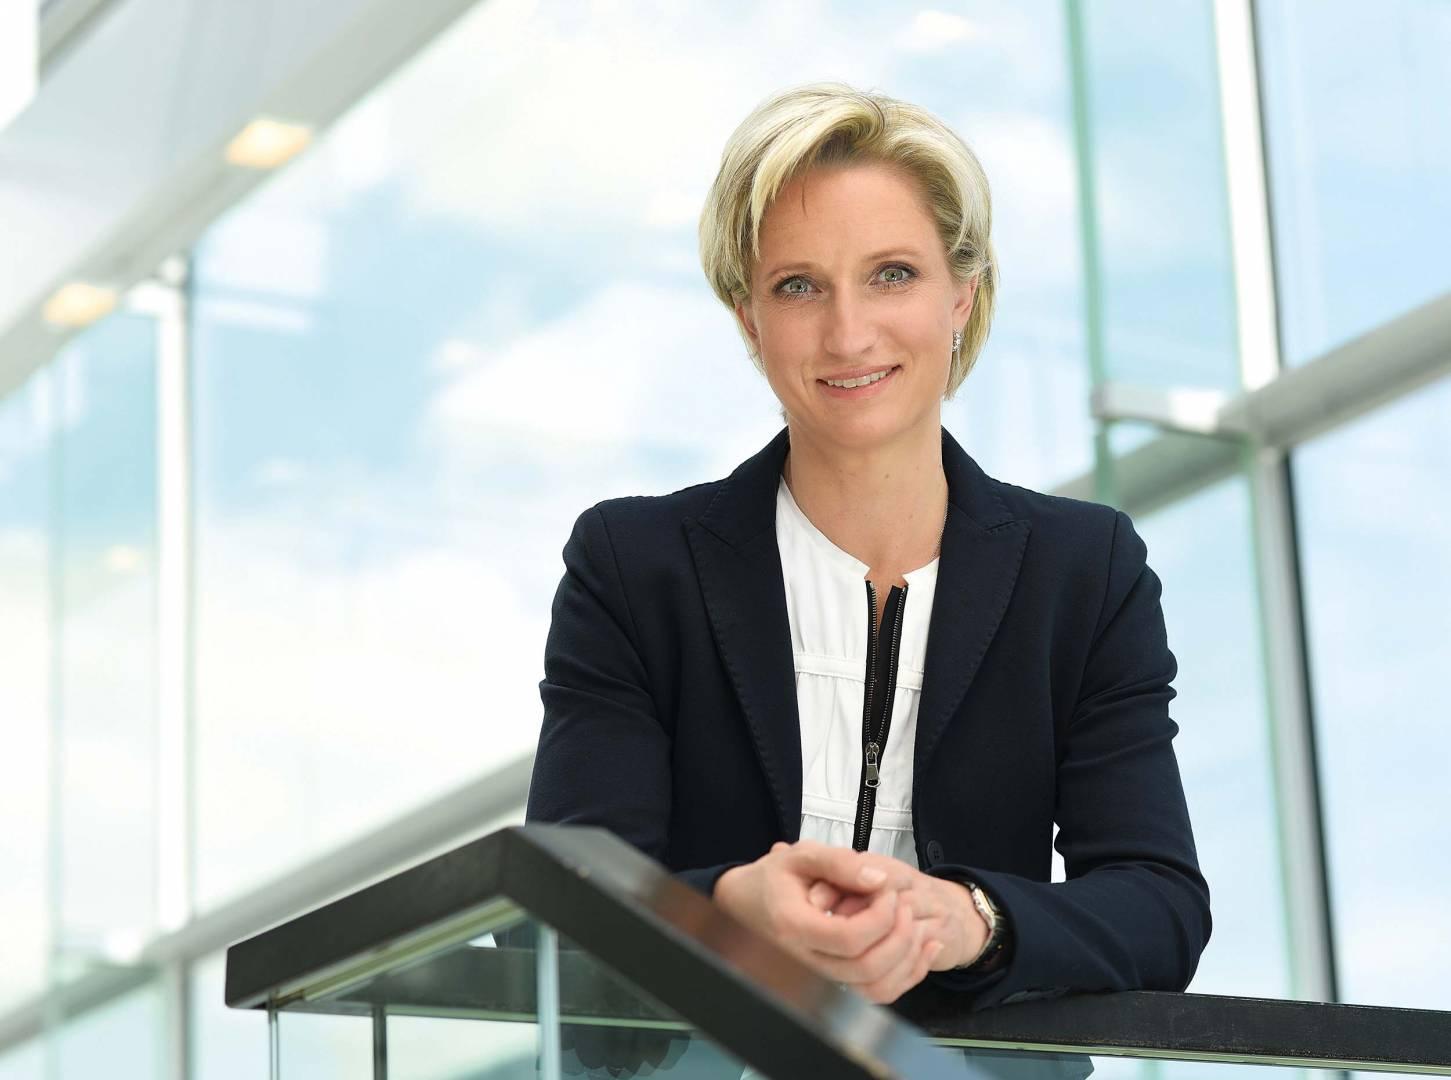 Dr._Nicole_HoffmeisterKraut_MdL